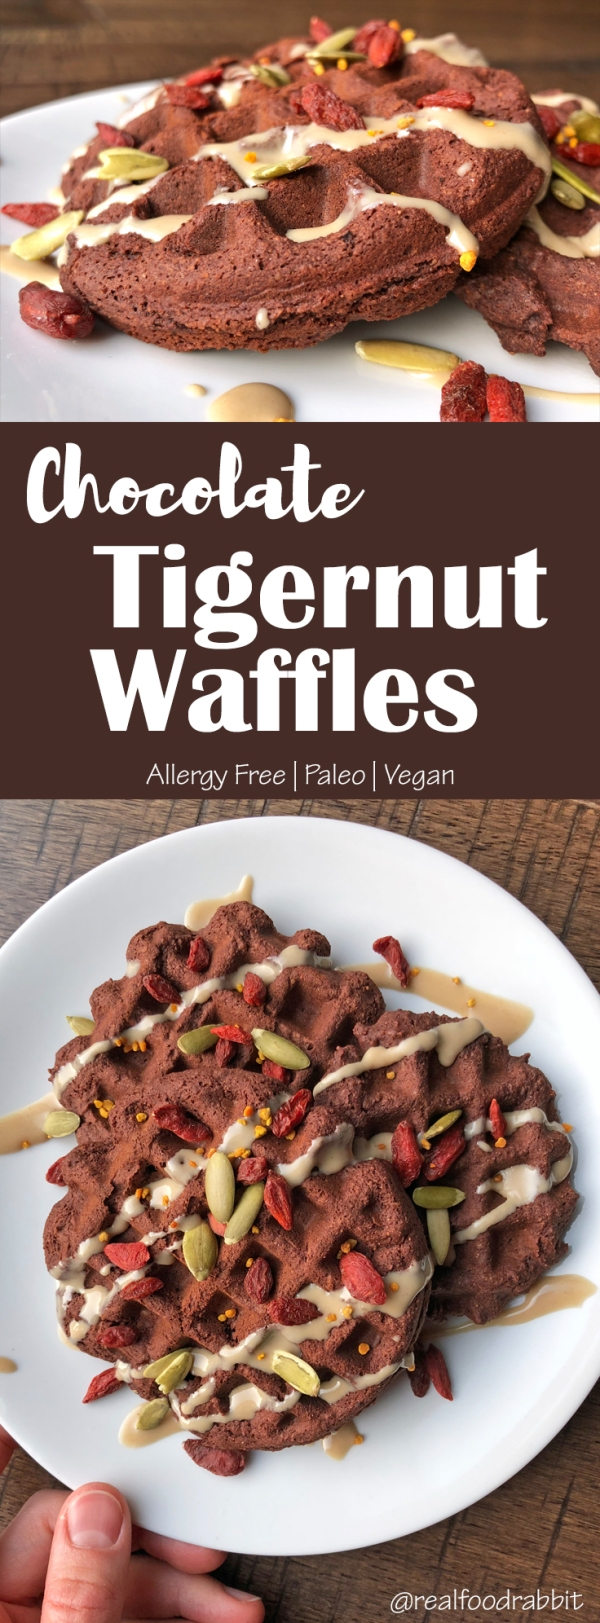 Chocolate Tigernut Waffles